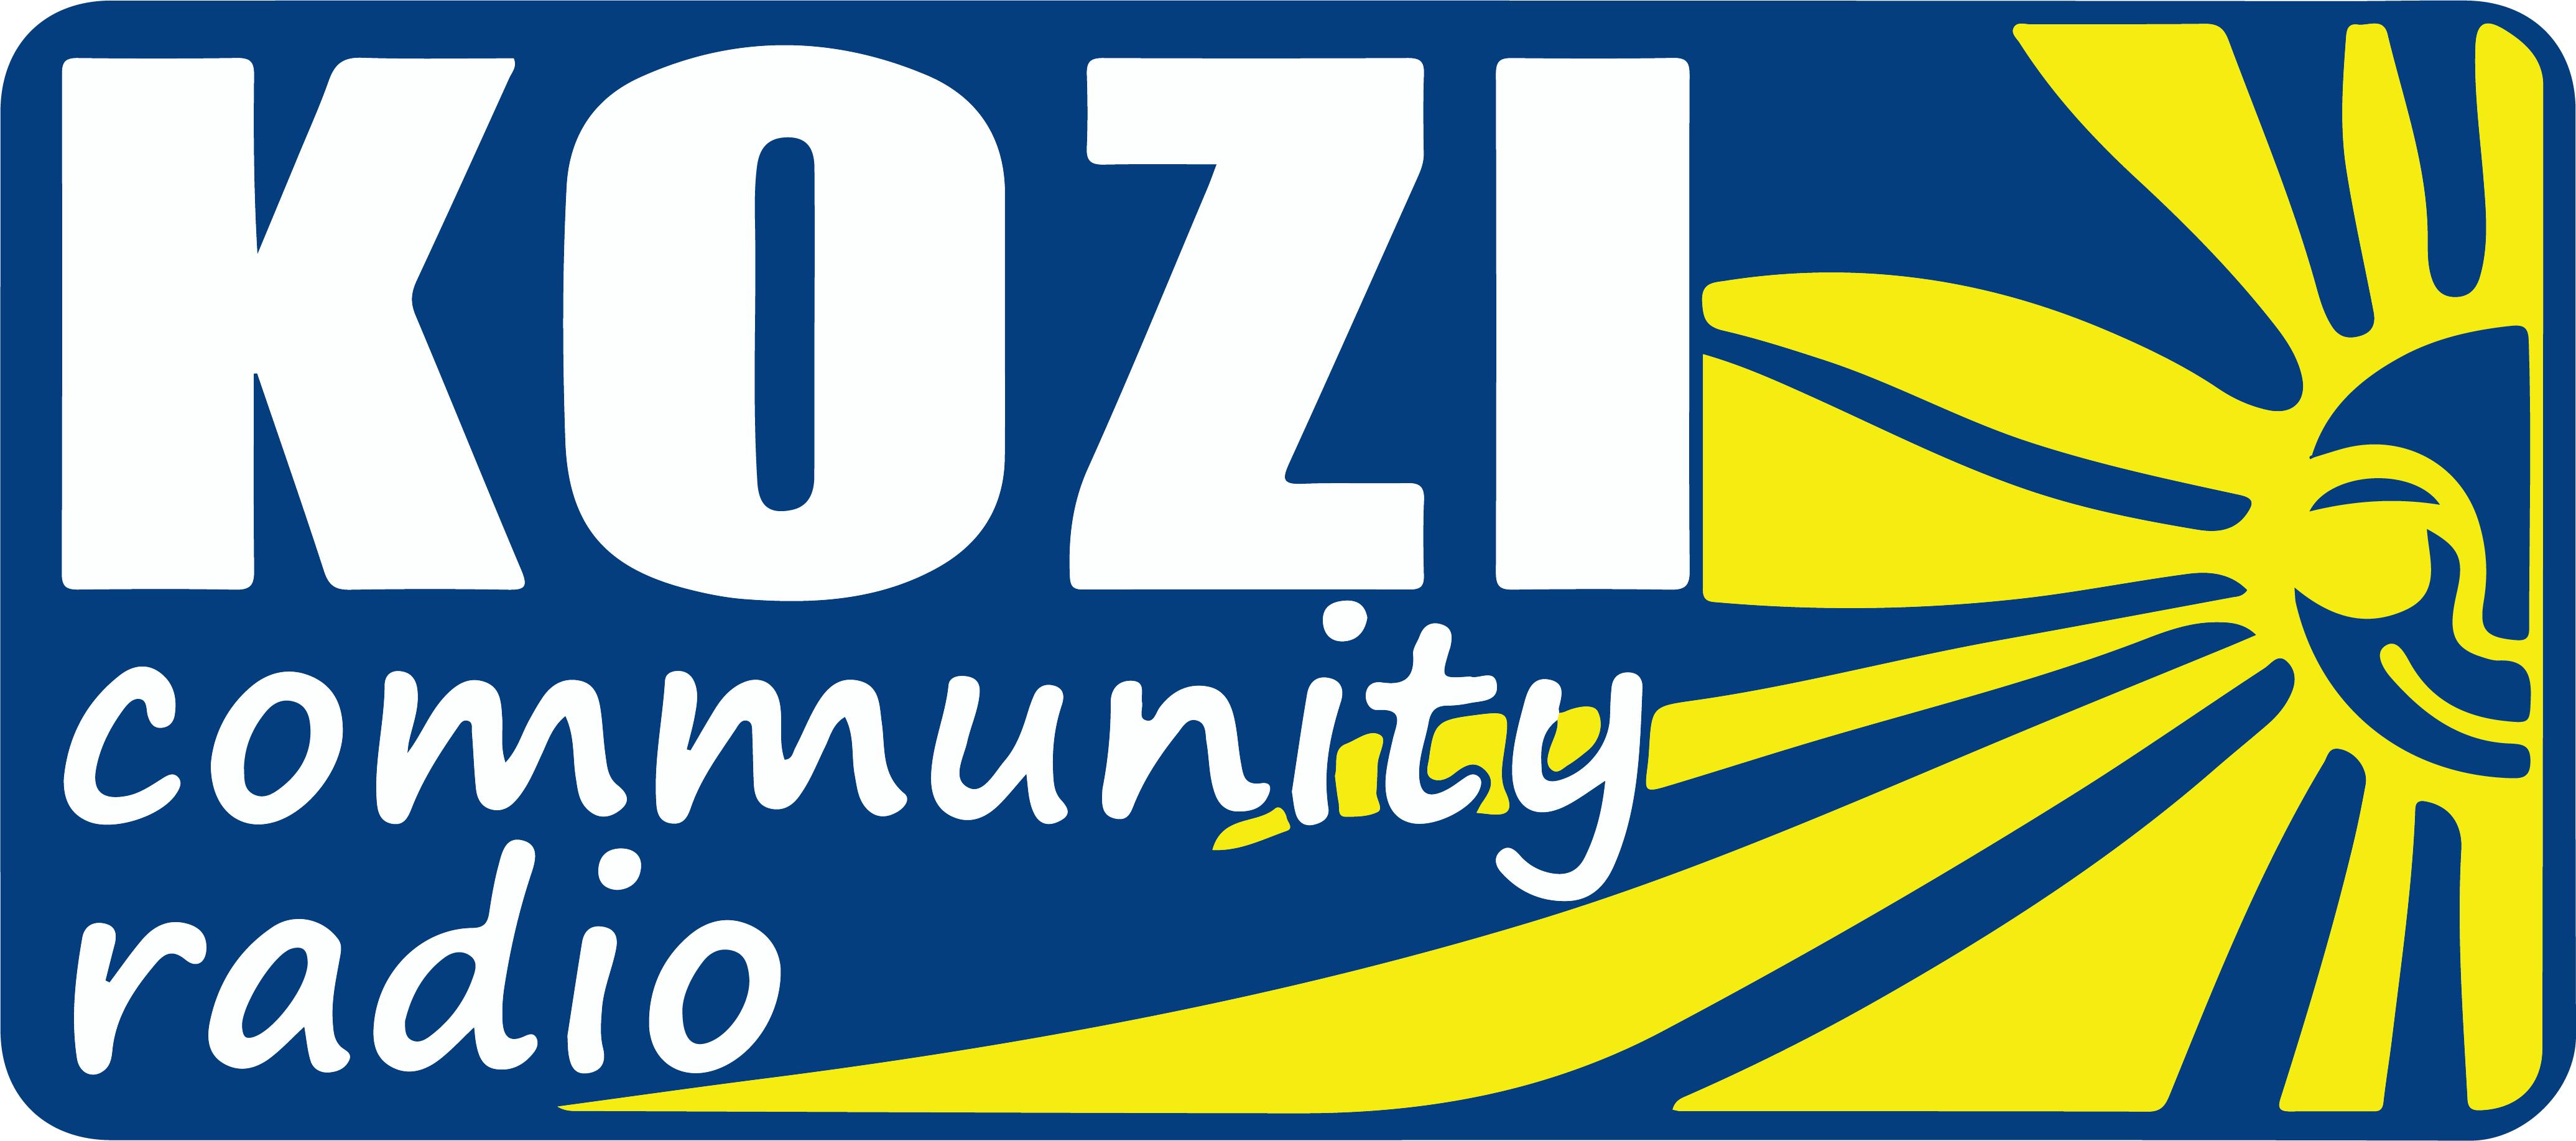 kozi_logo-03